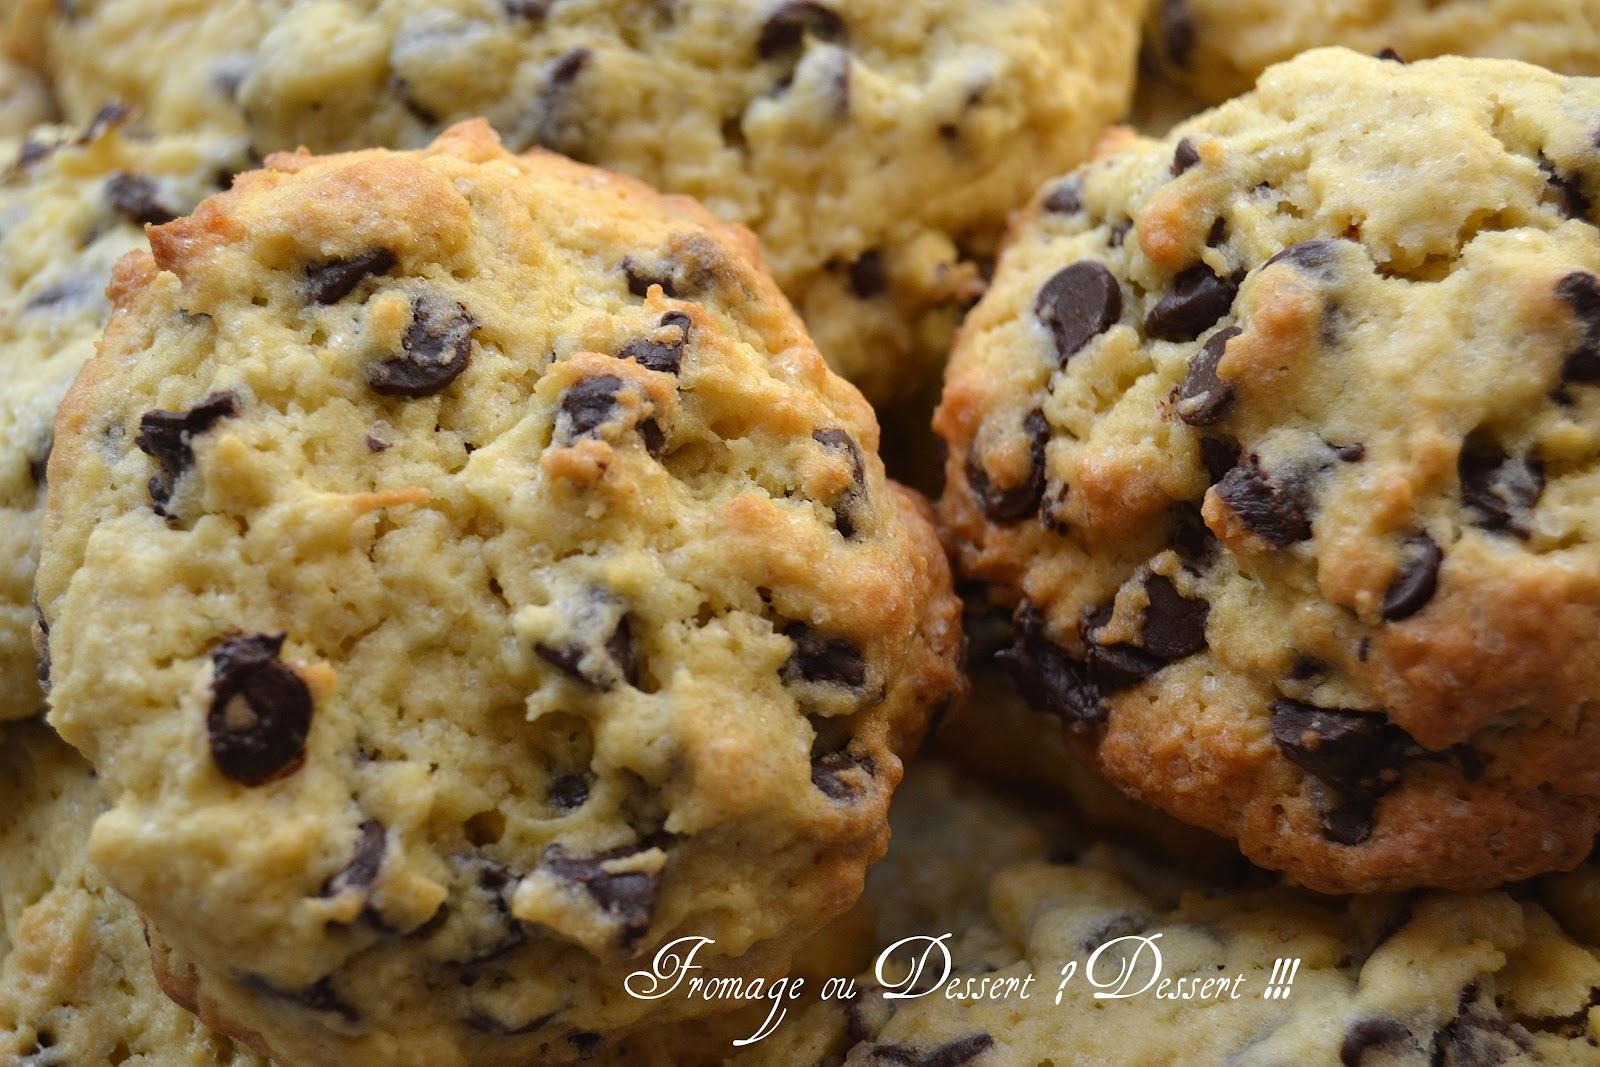 fromage ou dessert dessert cookies ultra moelleux. Black Bedroom Furniture Sets. Home Design Ideas